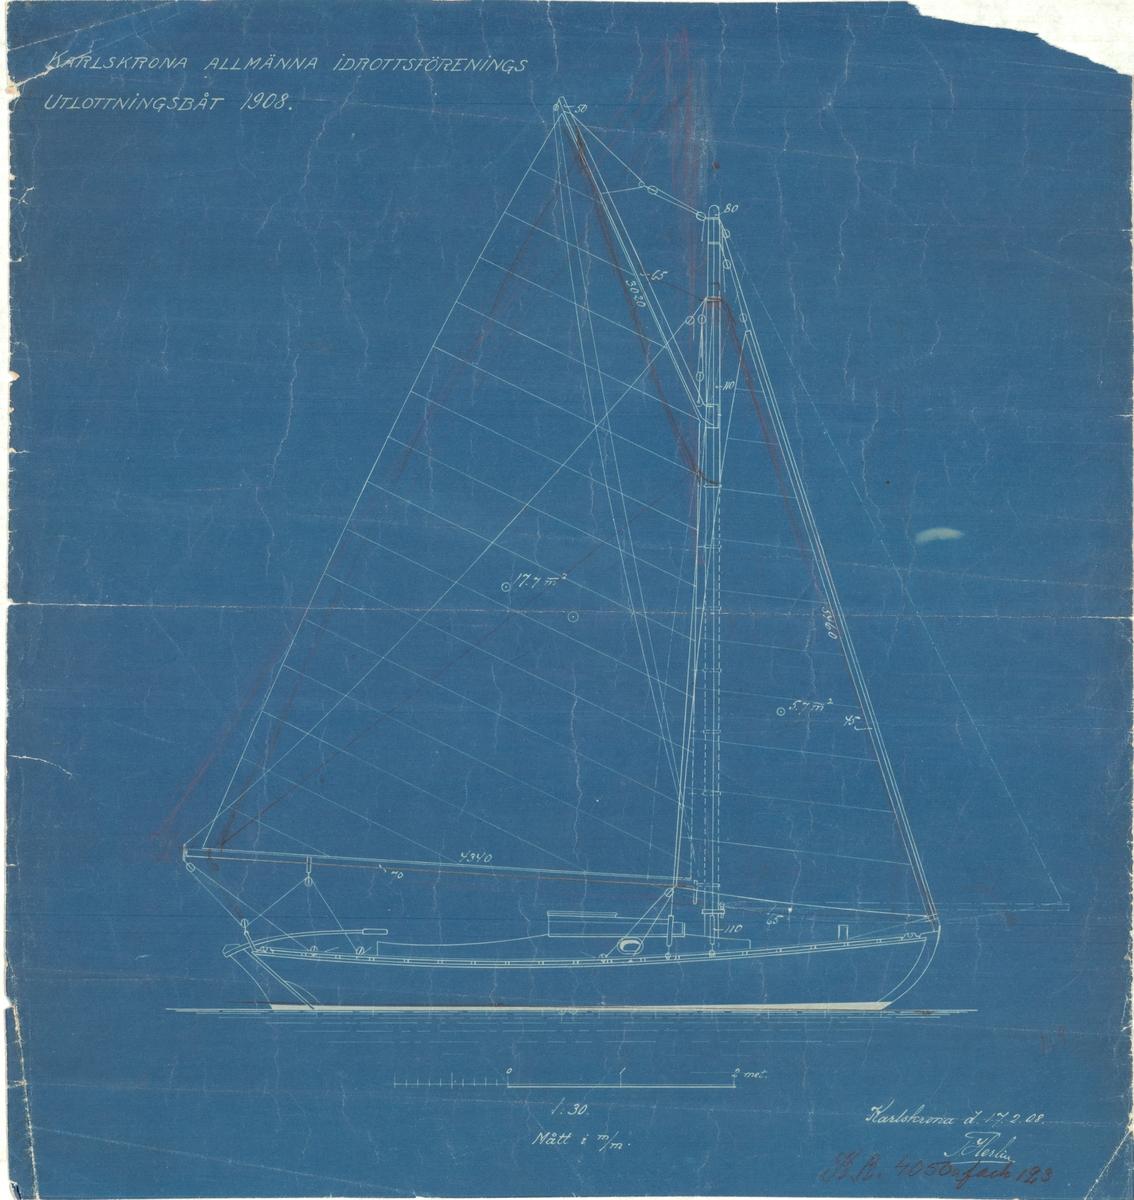 Plan, profil, spant och segelritning